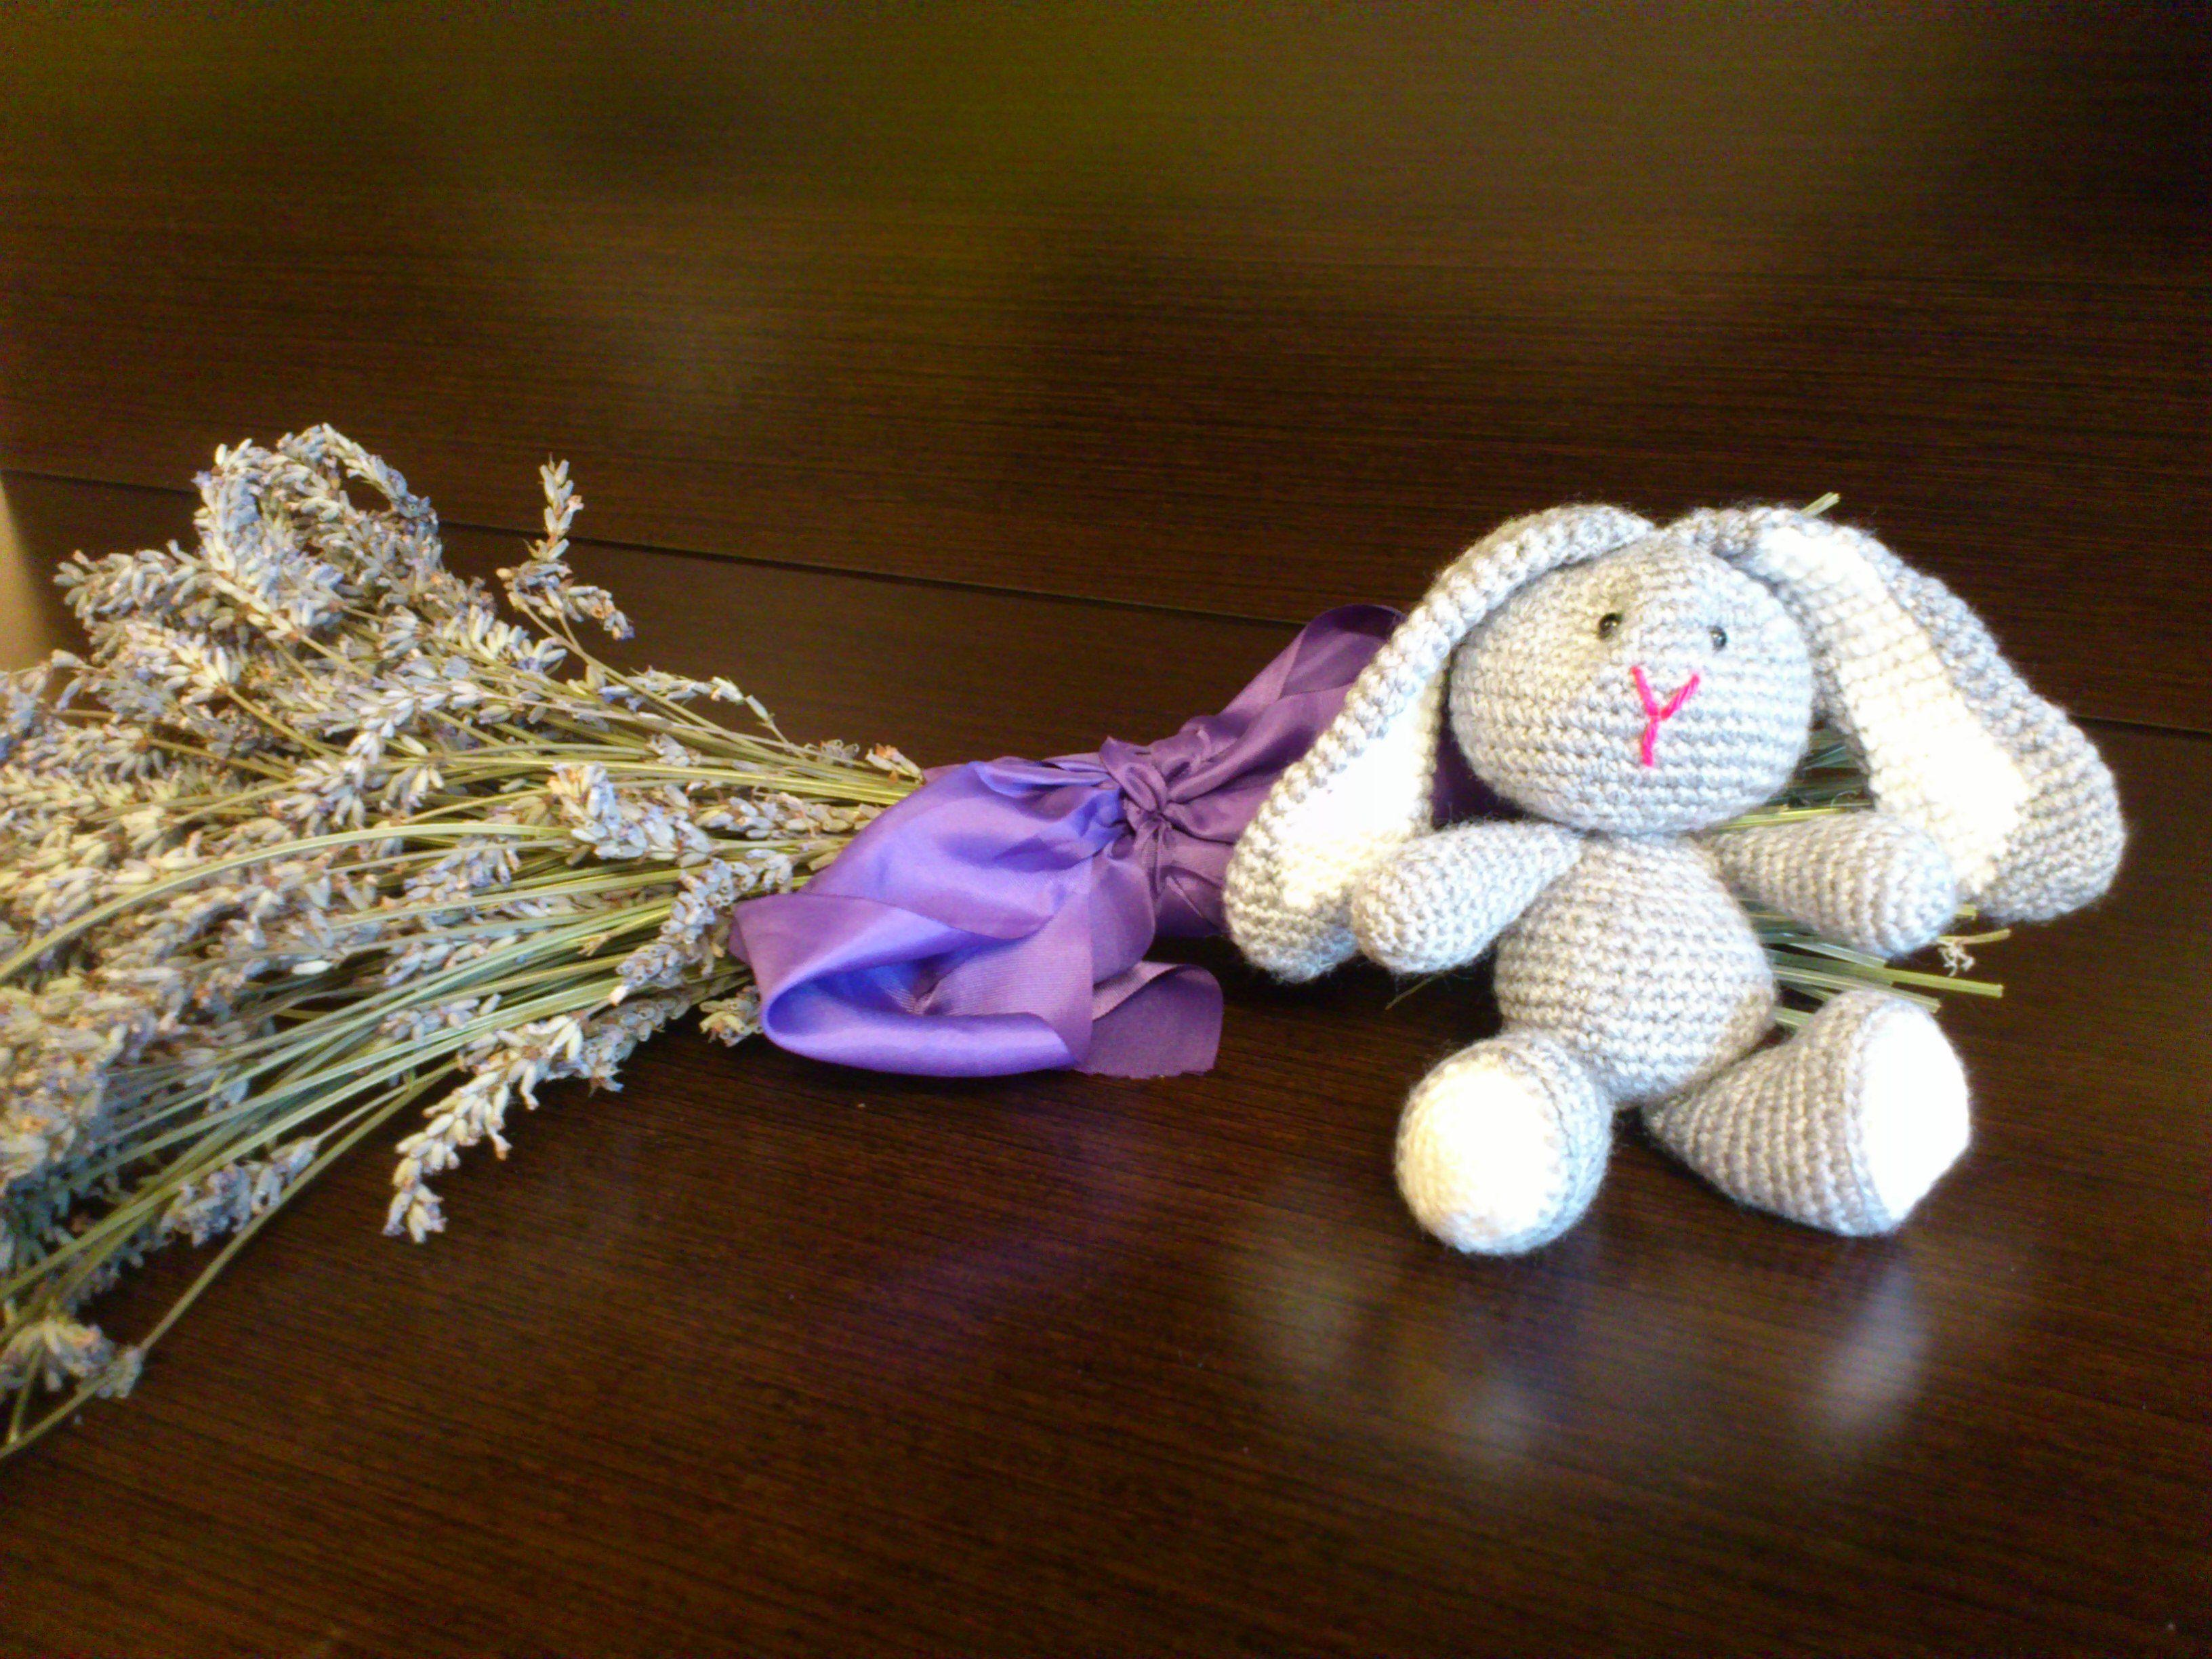 Conejito a #crochet #handmade #ganchillo #hechoamano